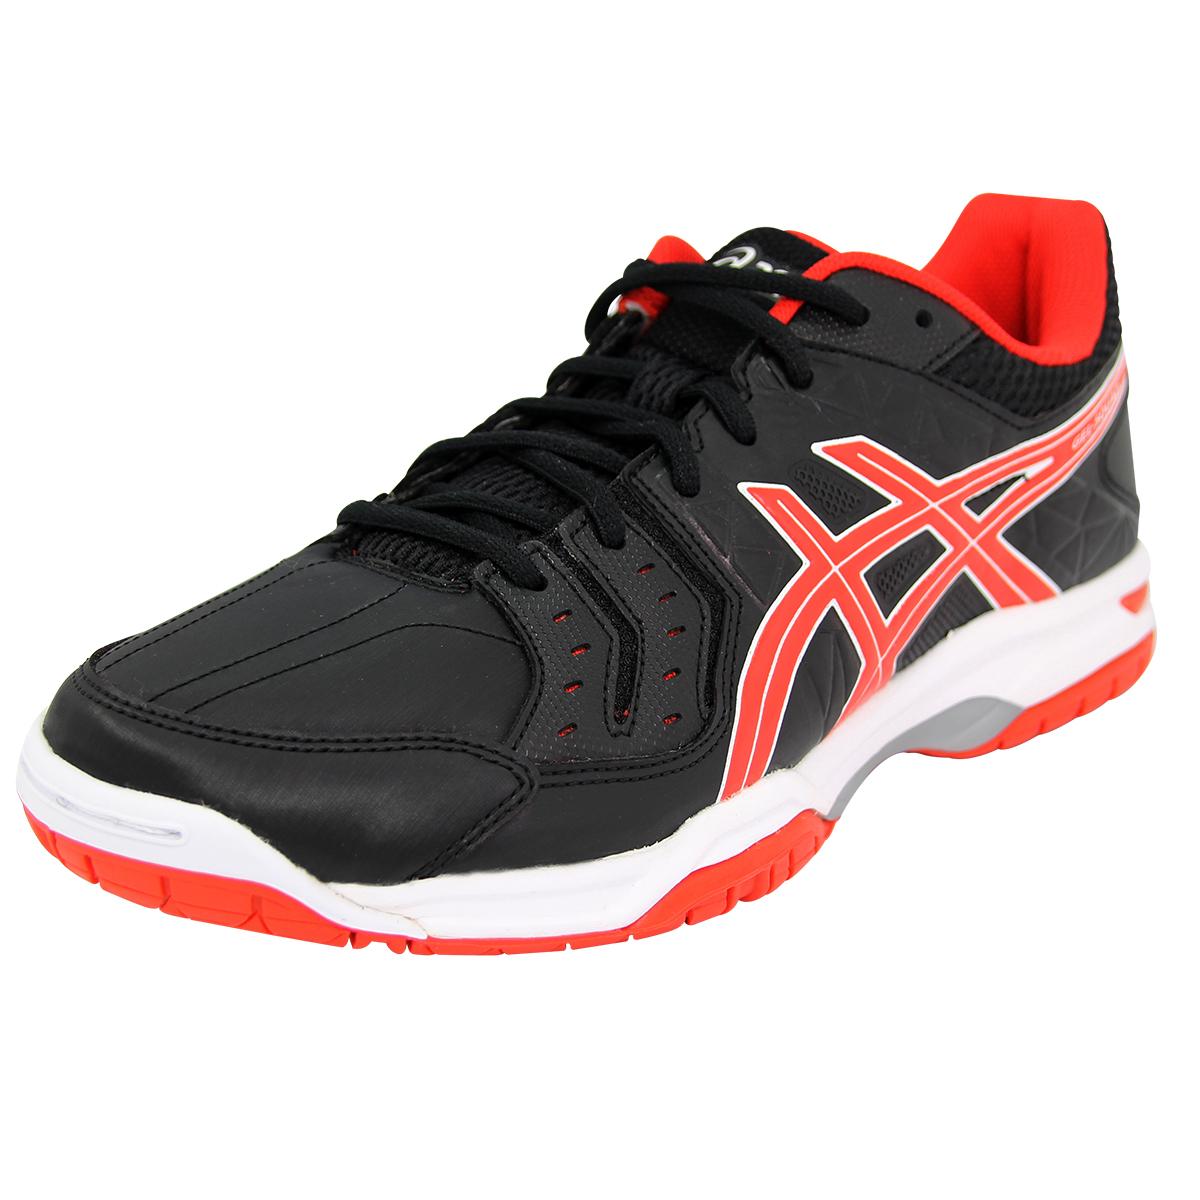 classic fit 76a3c 13b8a Asics GEL SQUAD Chaussures de Handball Homme Non Marking